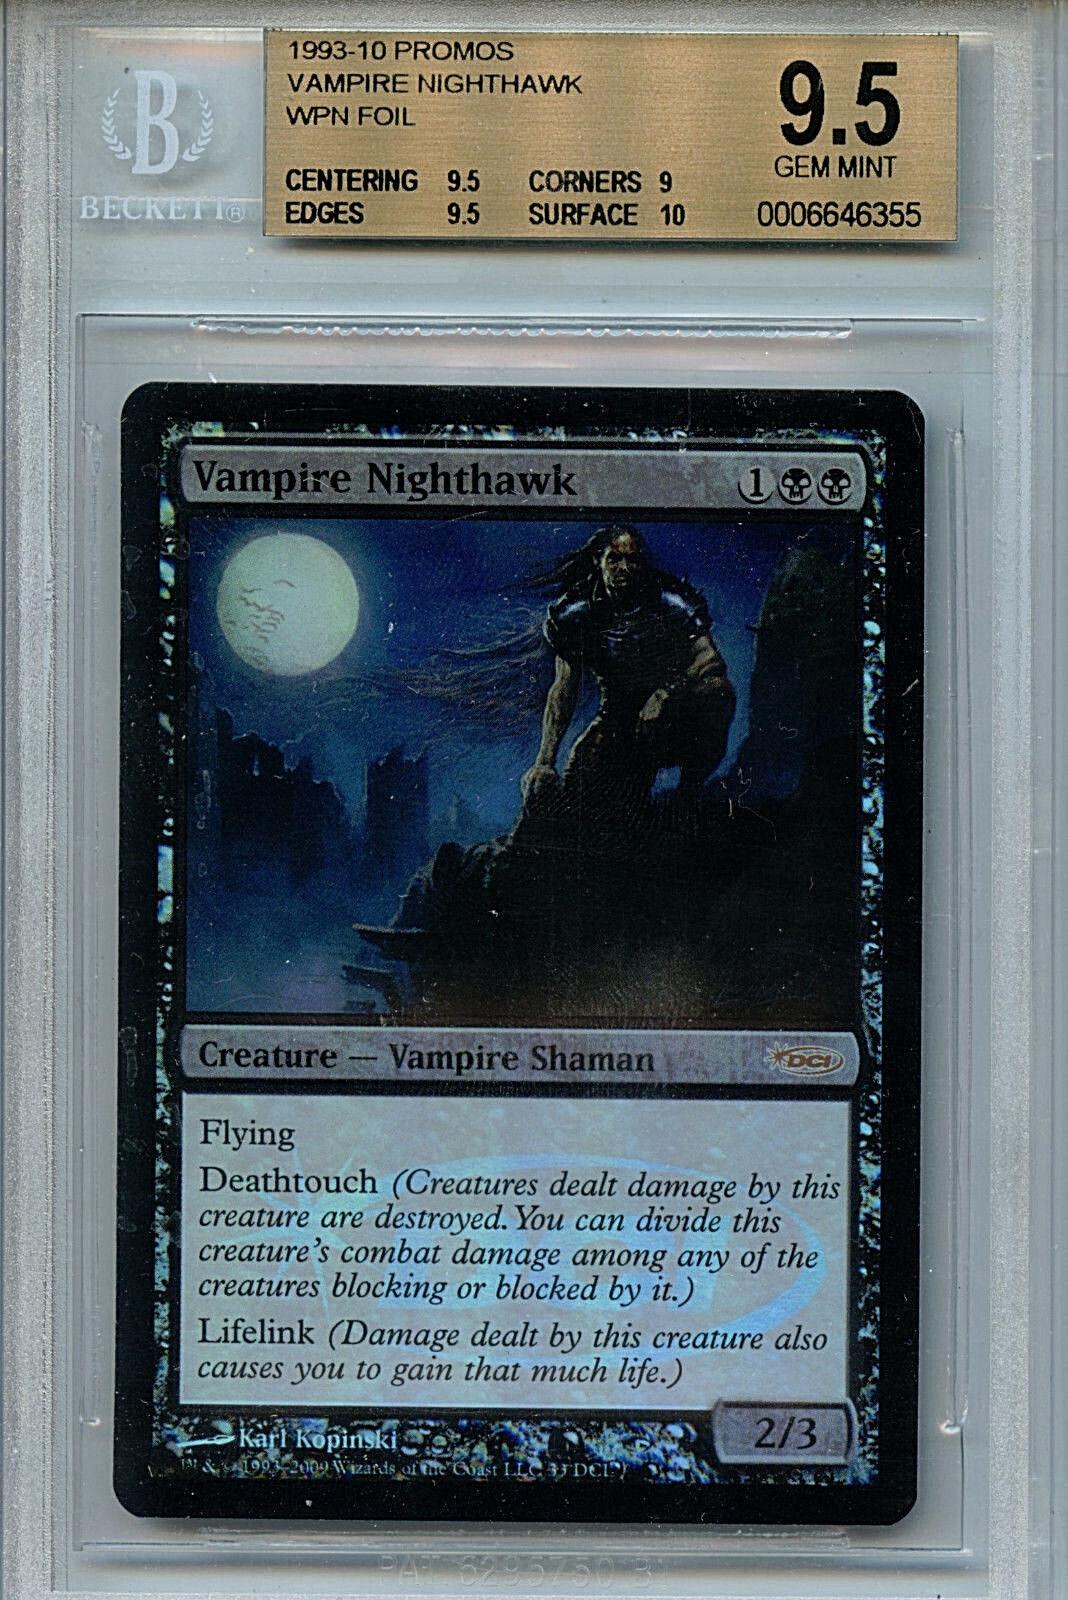 MTG Vampire Nighthawk BGS 9.5 Gem Mt WPN Promos 1993-10 Magic Foil card Amricons